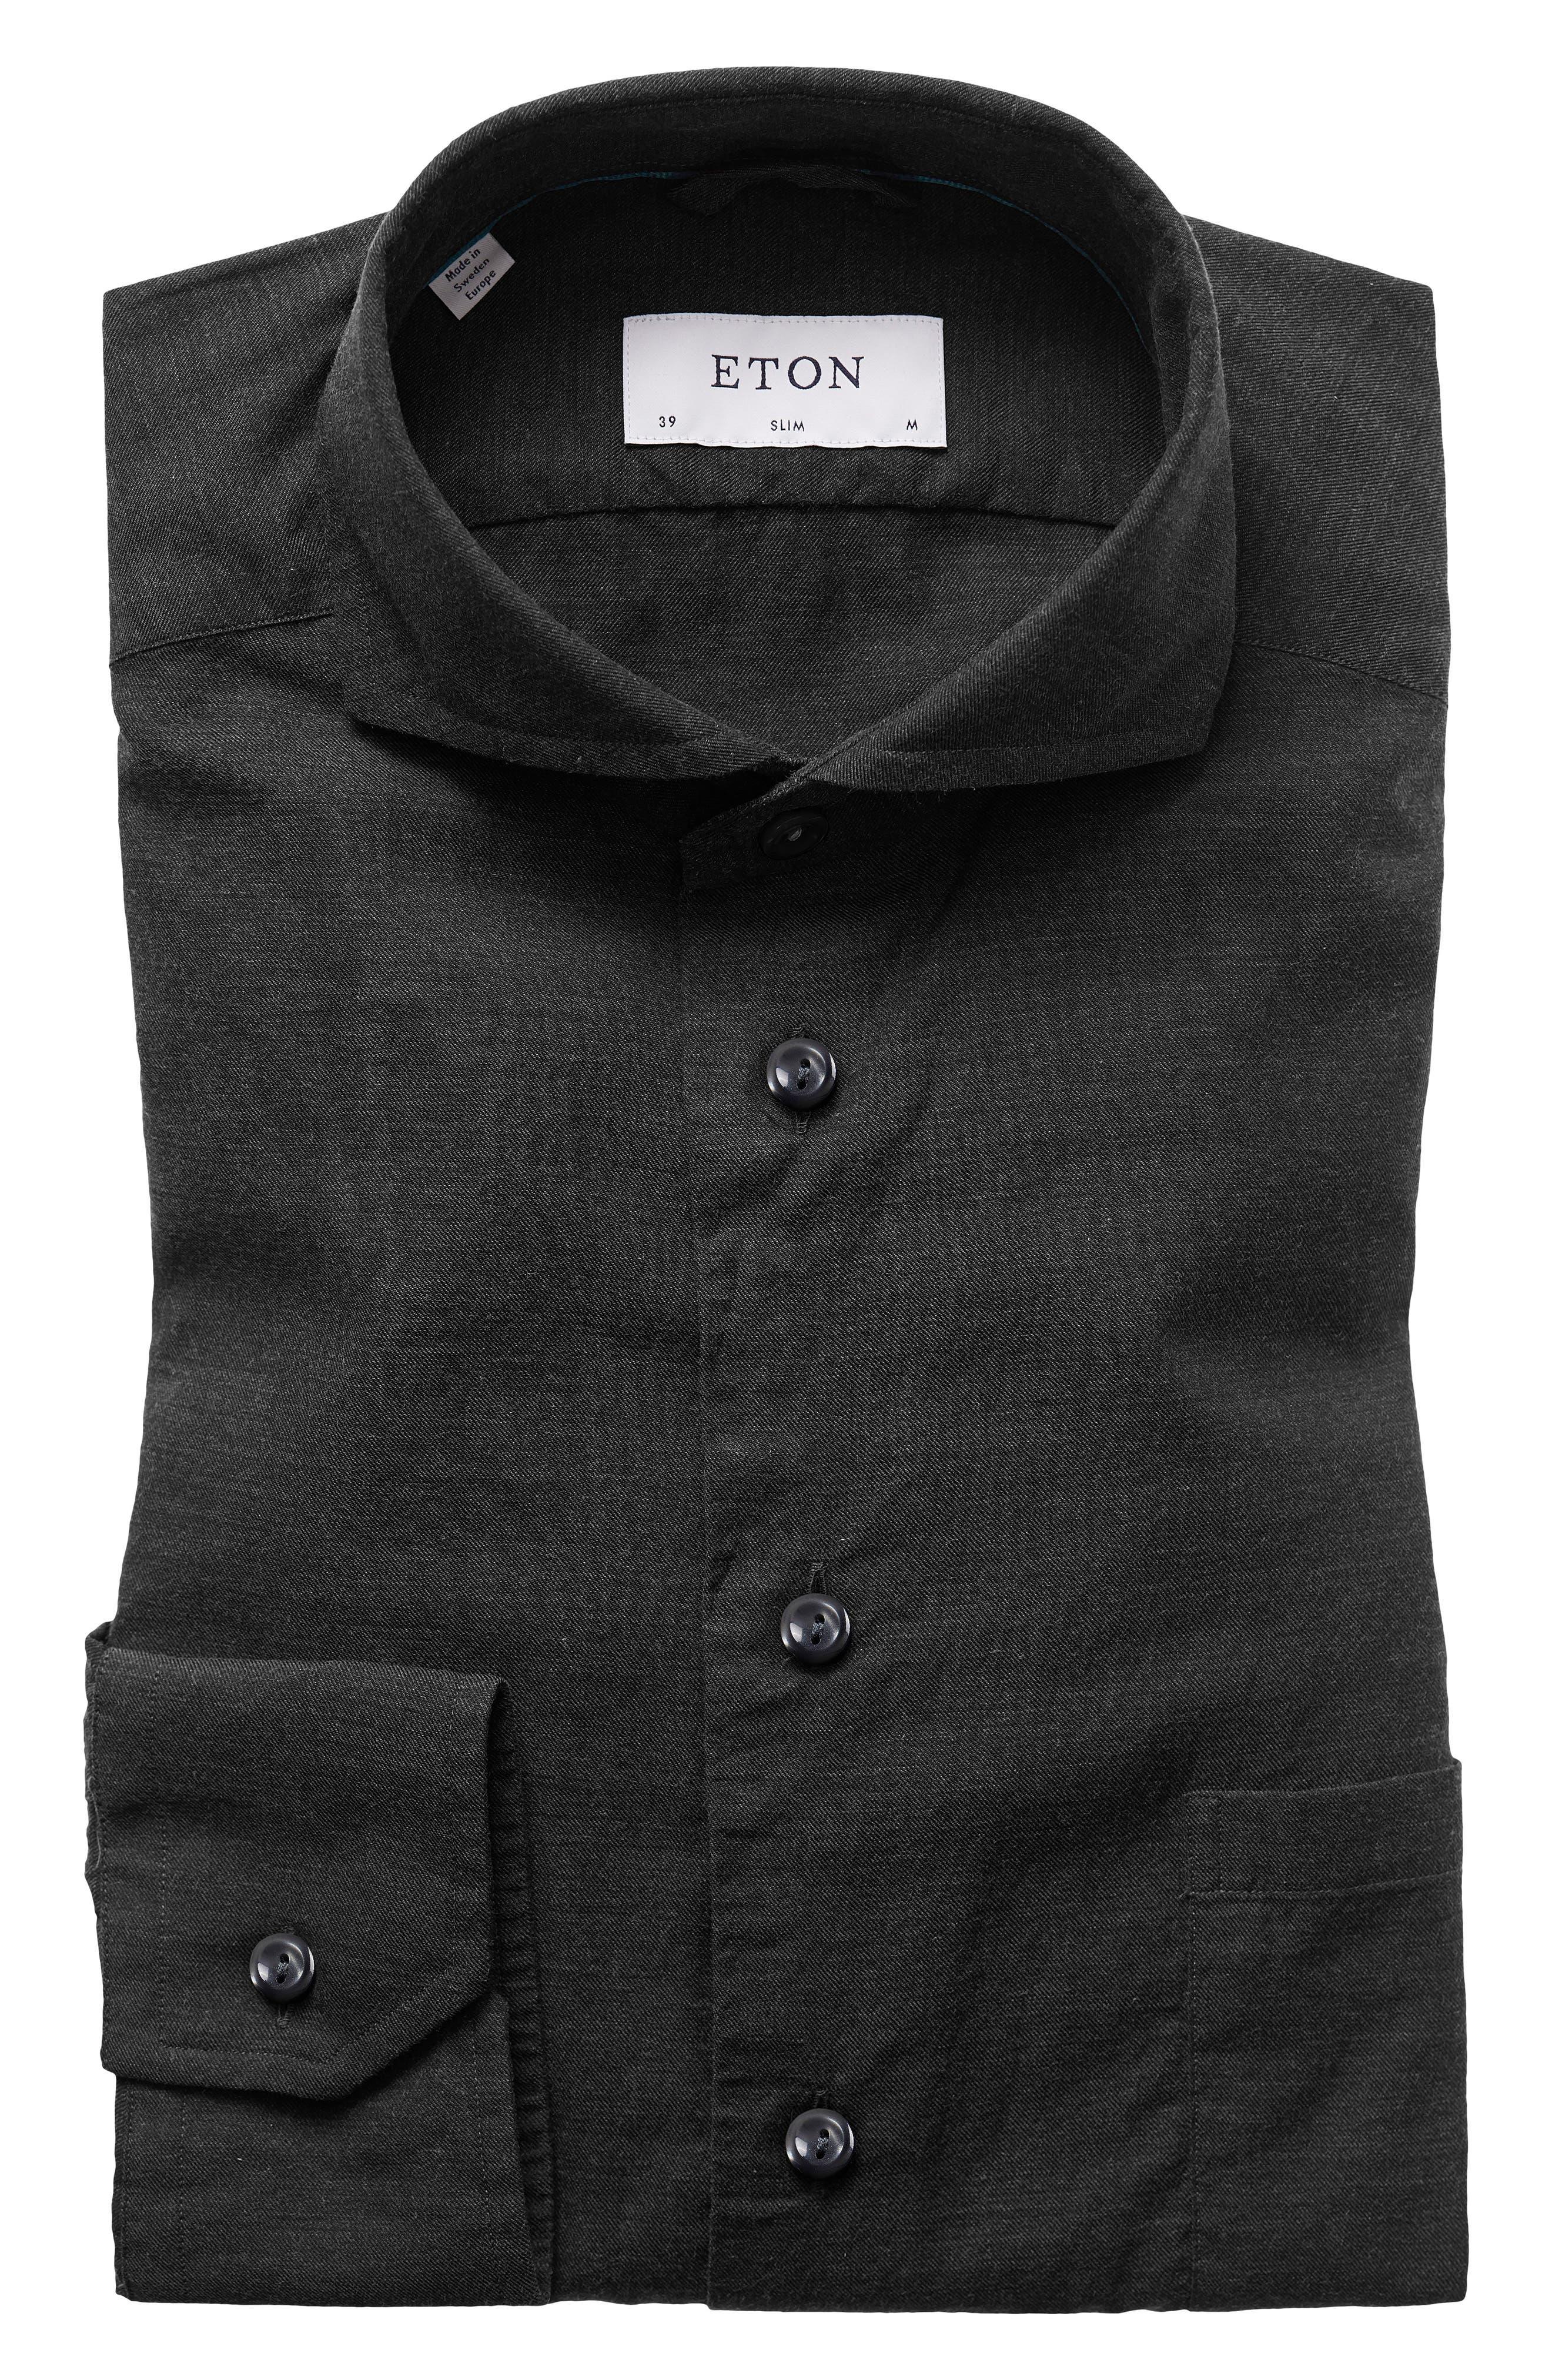 ETON,                             Slim Fit Solid Dress Shirt,                             Main thumbnail 1, color,                             001